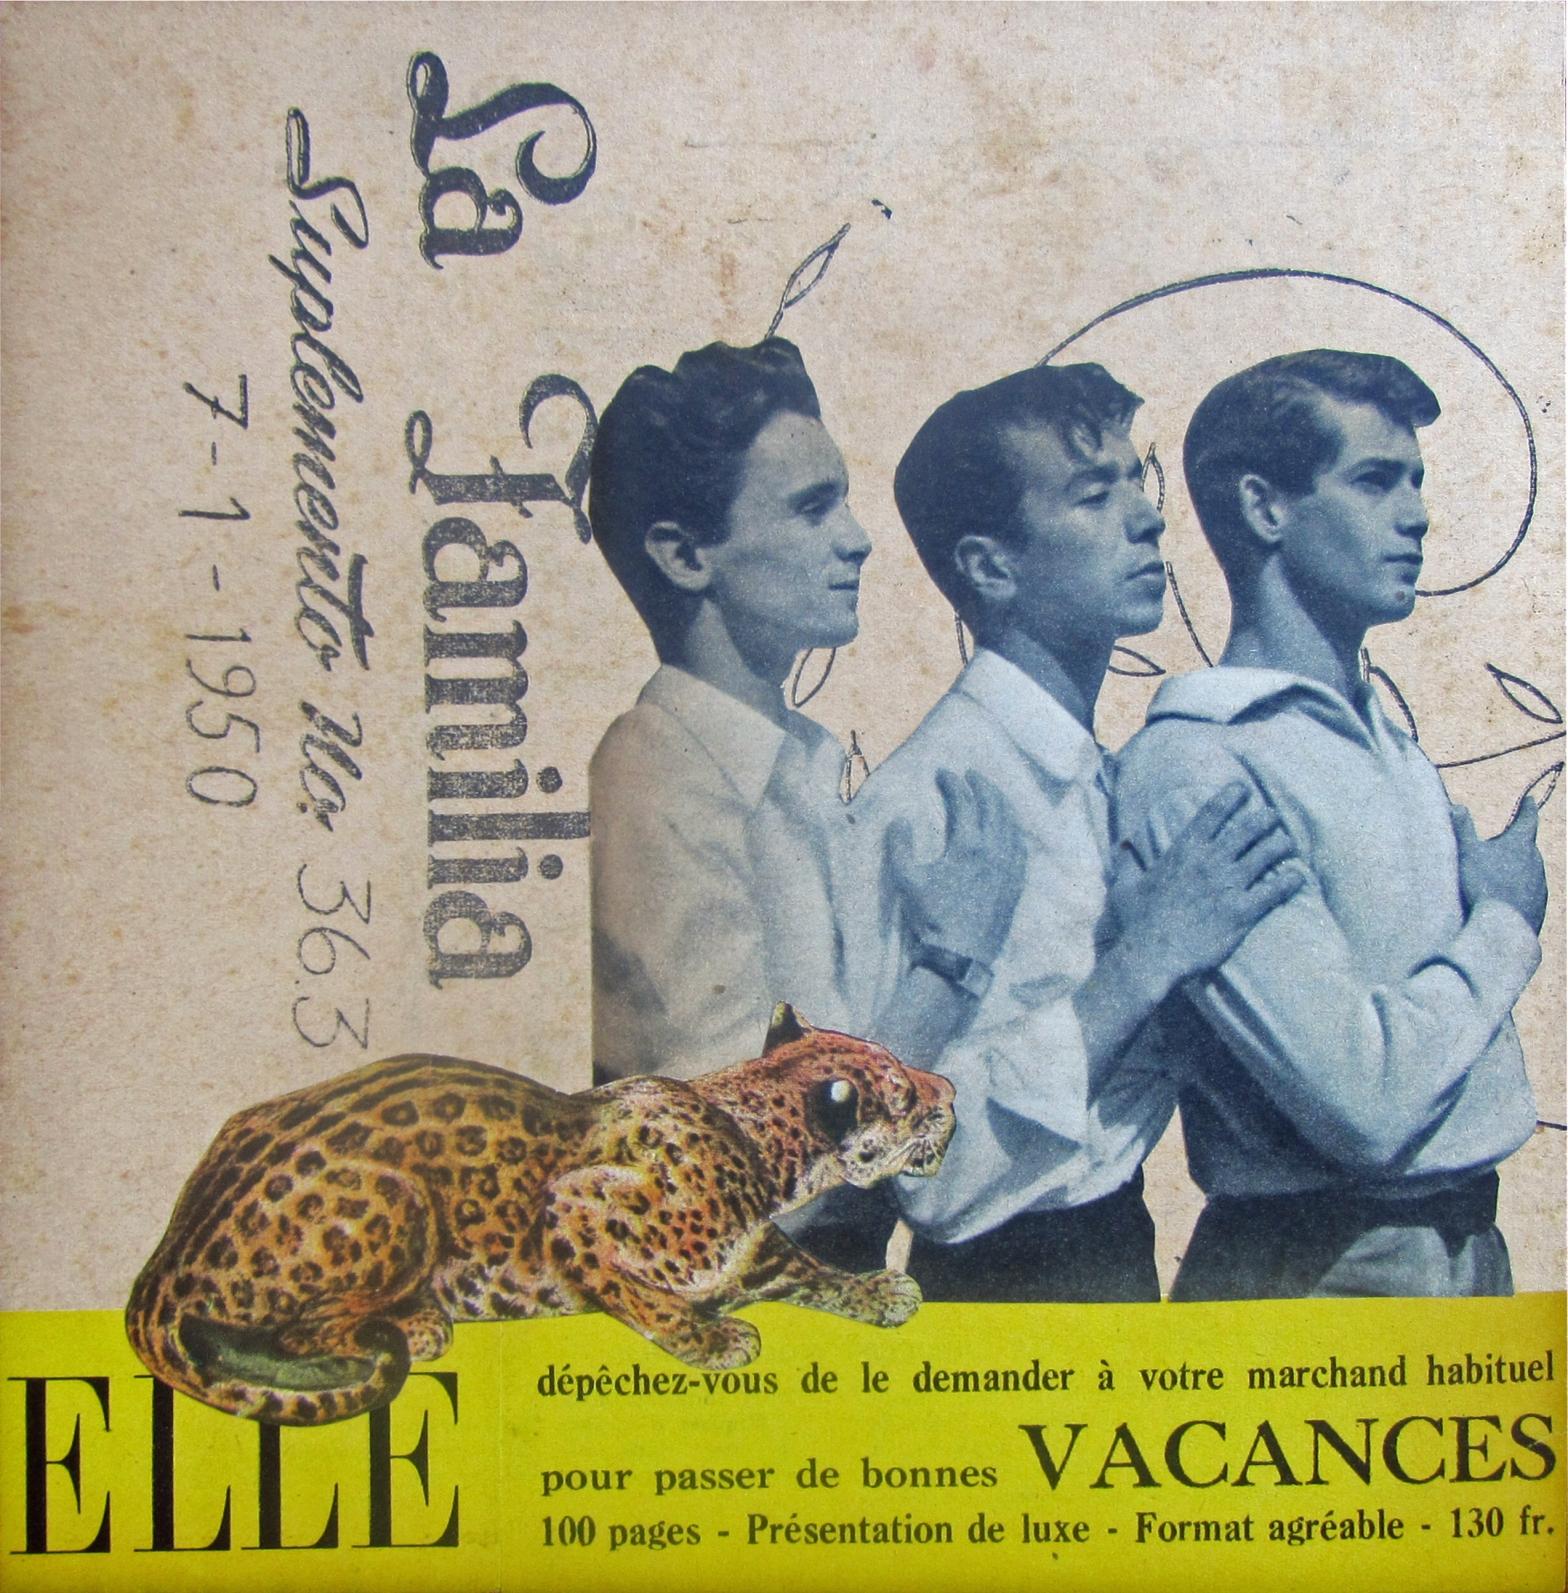 Elle, La familia, Laura UPS, collage, art, hipster, tigre, vacances suplemento